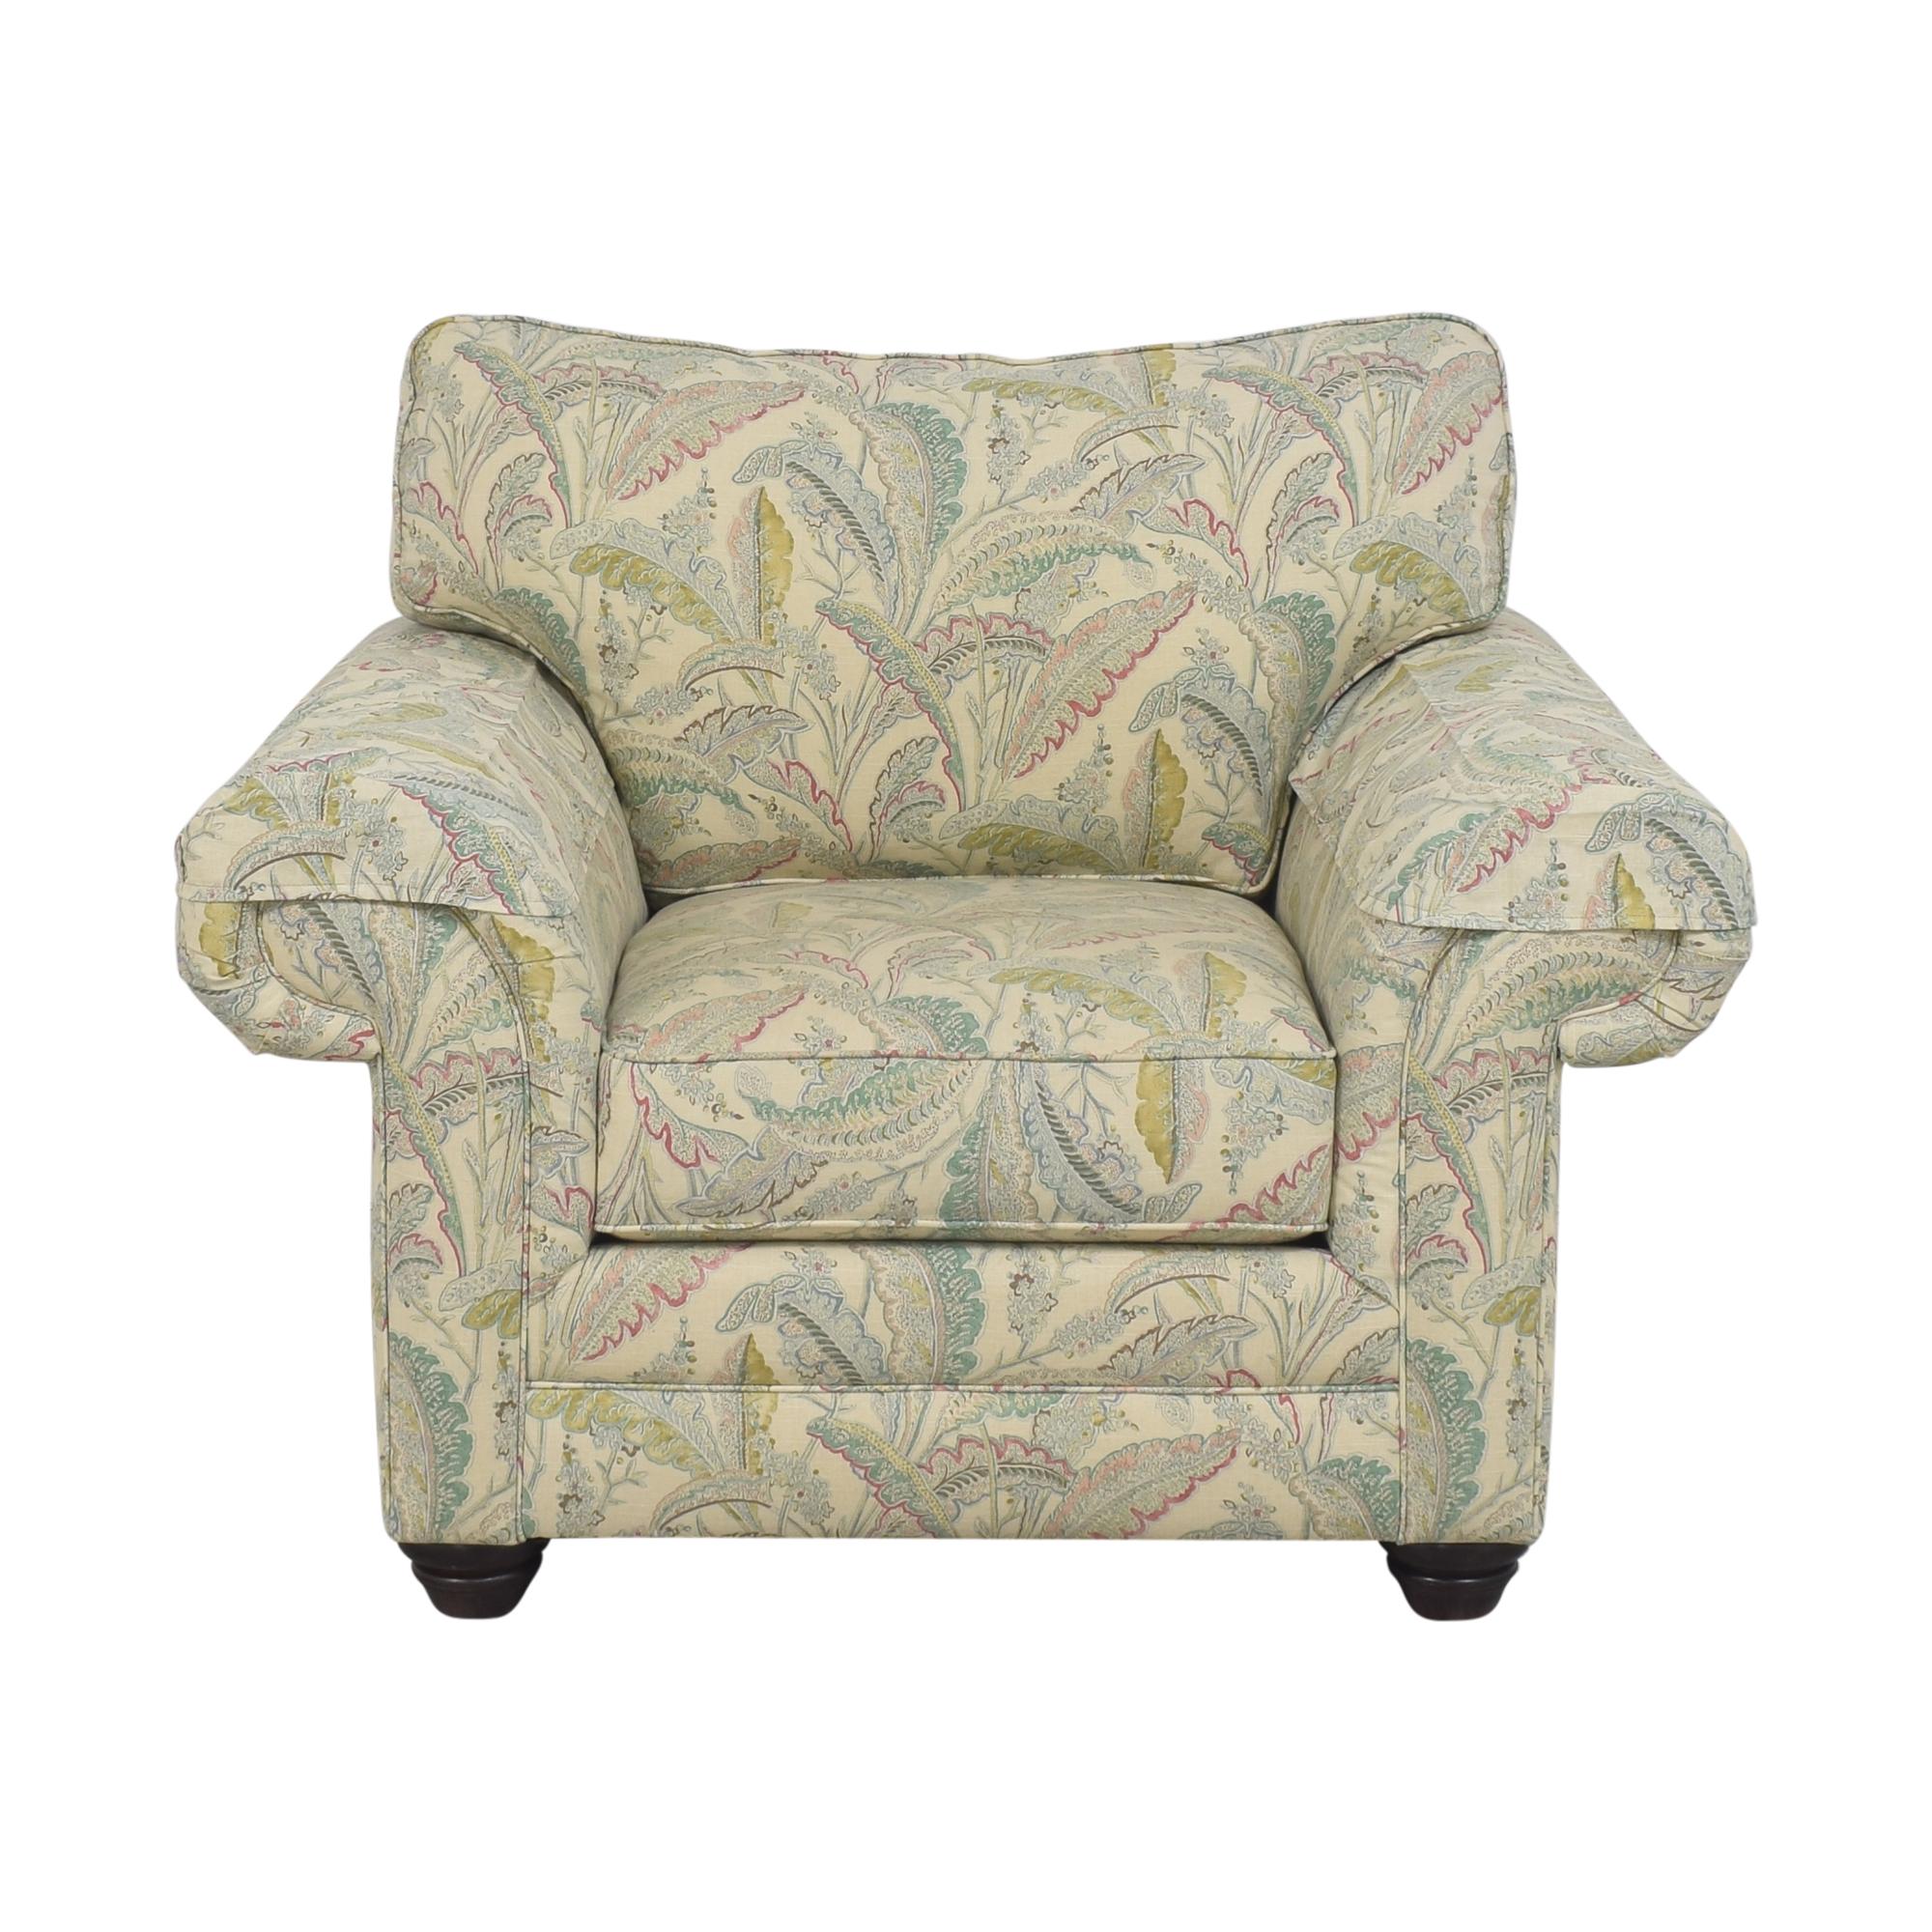 Bassett Furniture Bassett Furniture Custom Upholstered Arm Chair Accent Chairs